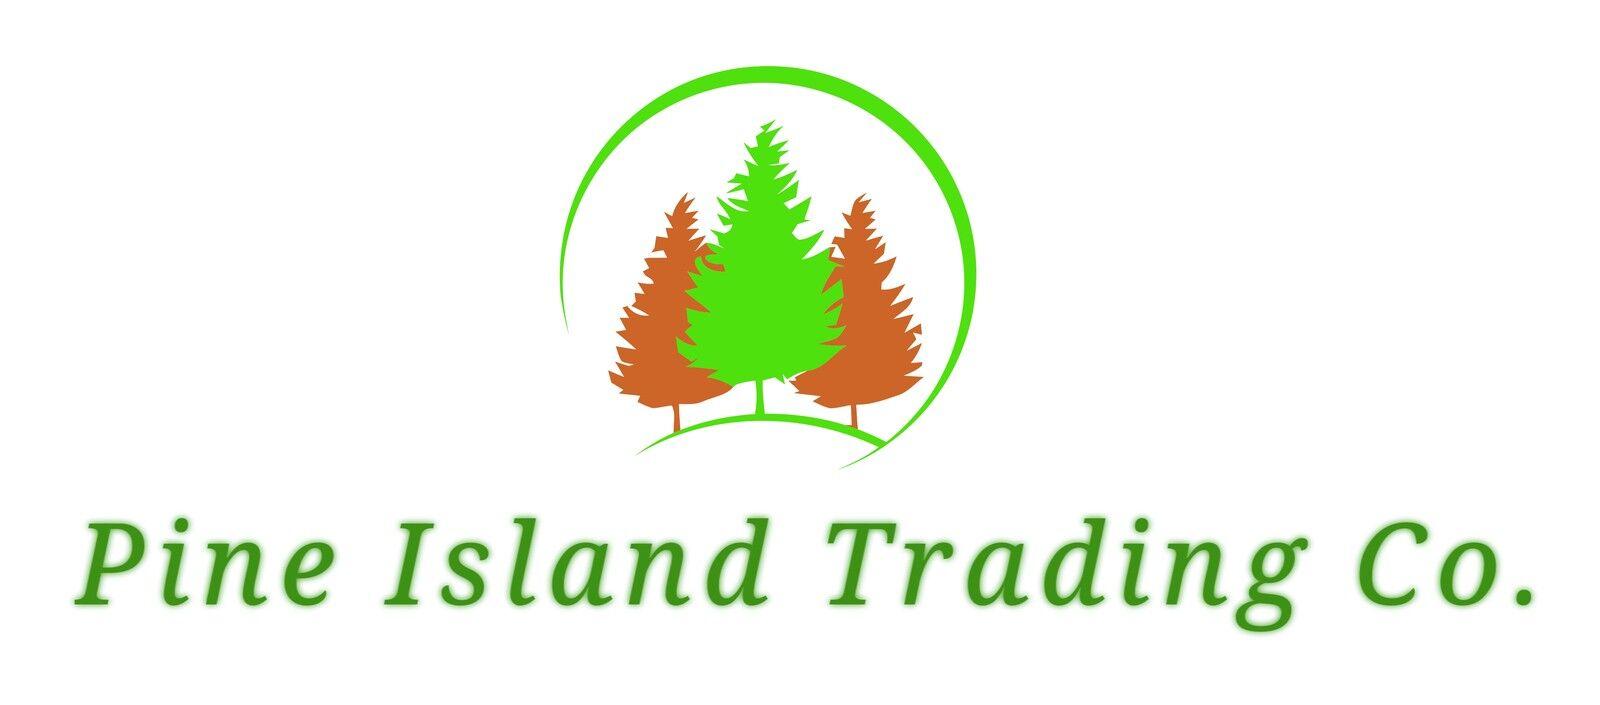 Pine Island Trading Co.